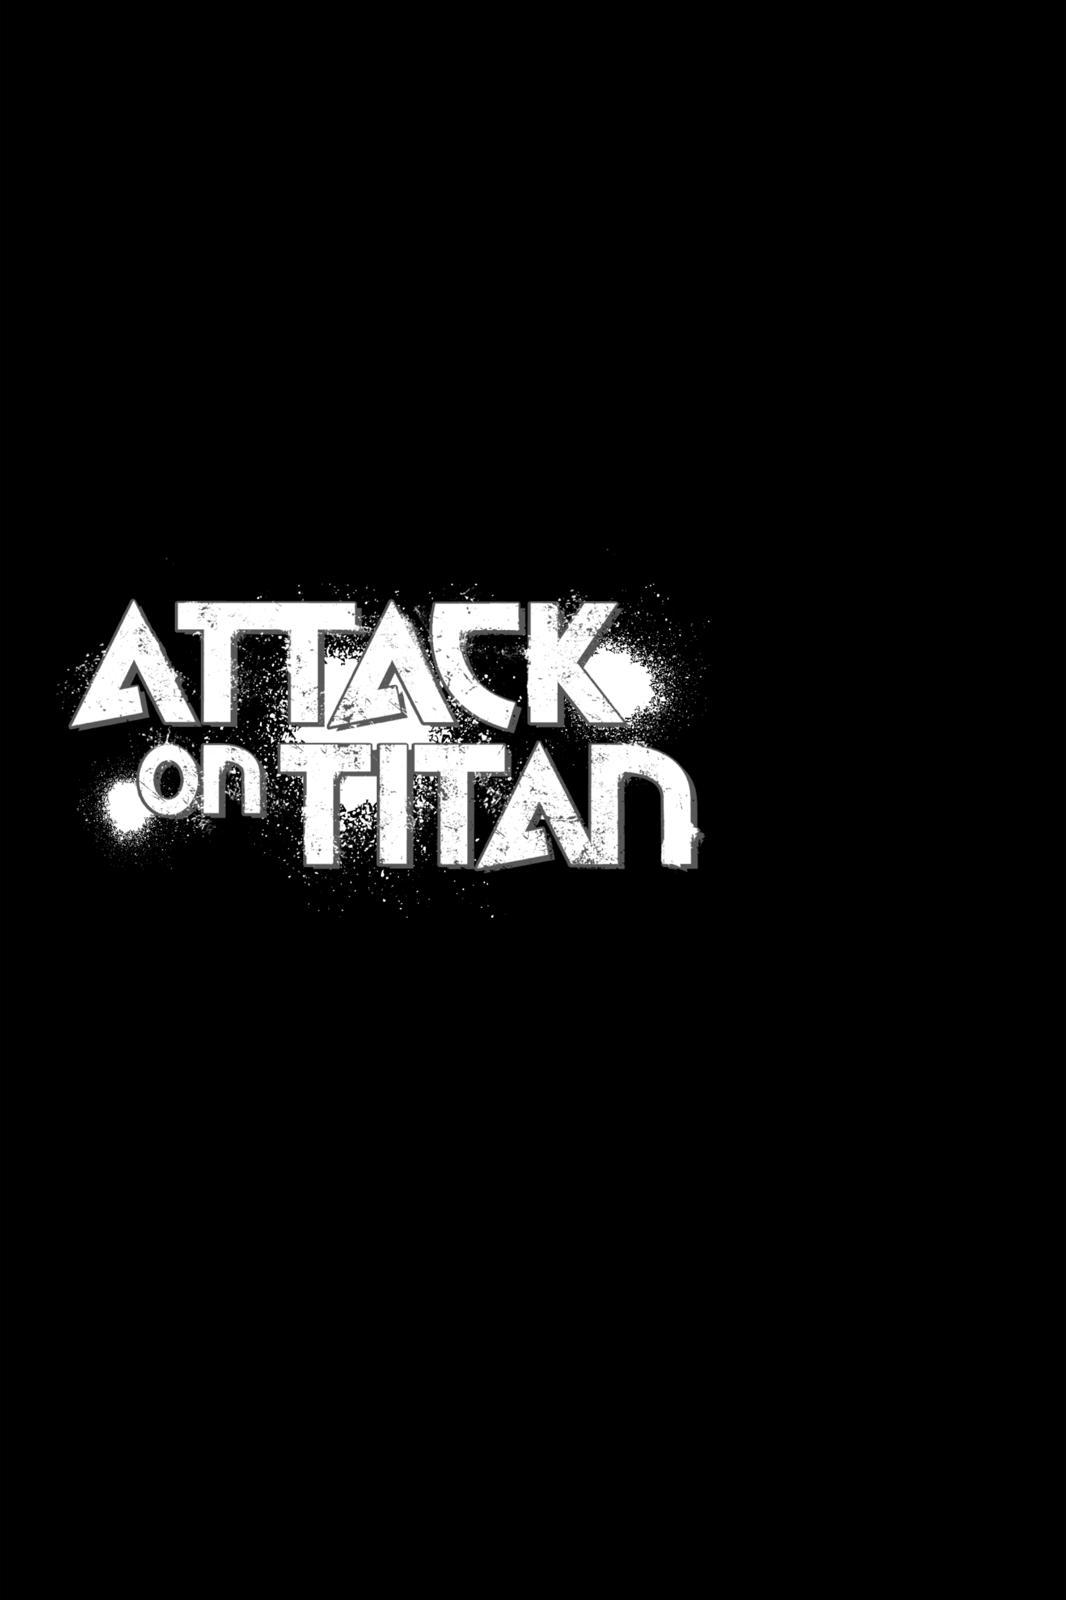 Attack On Titan, Episode 119 image 004